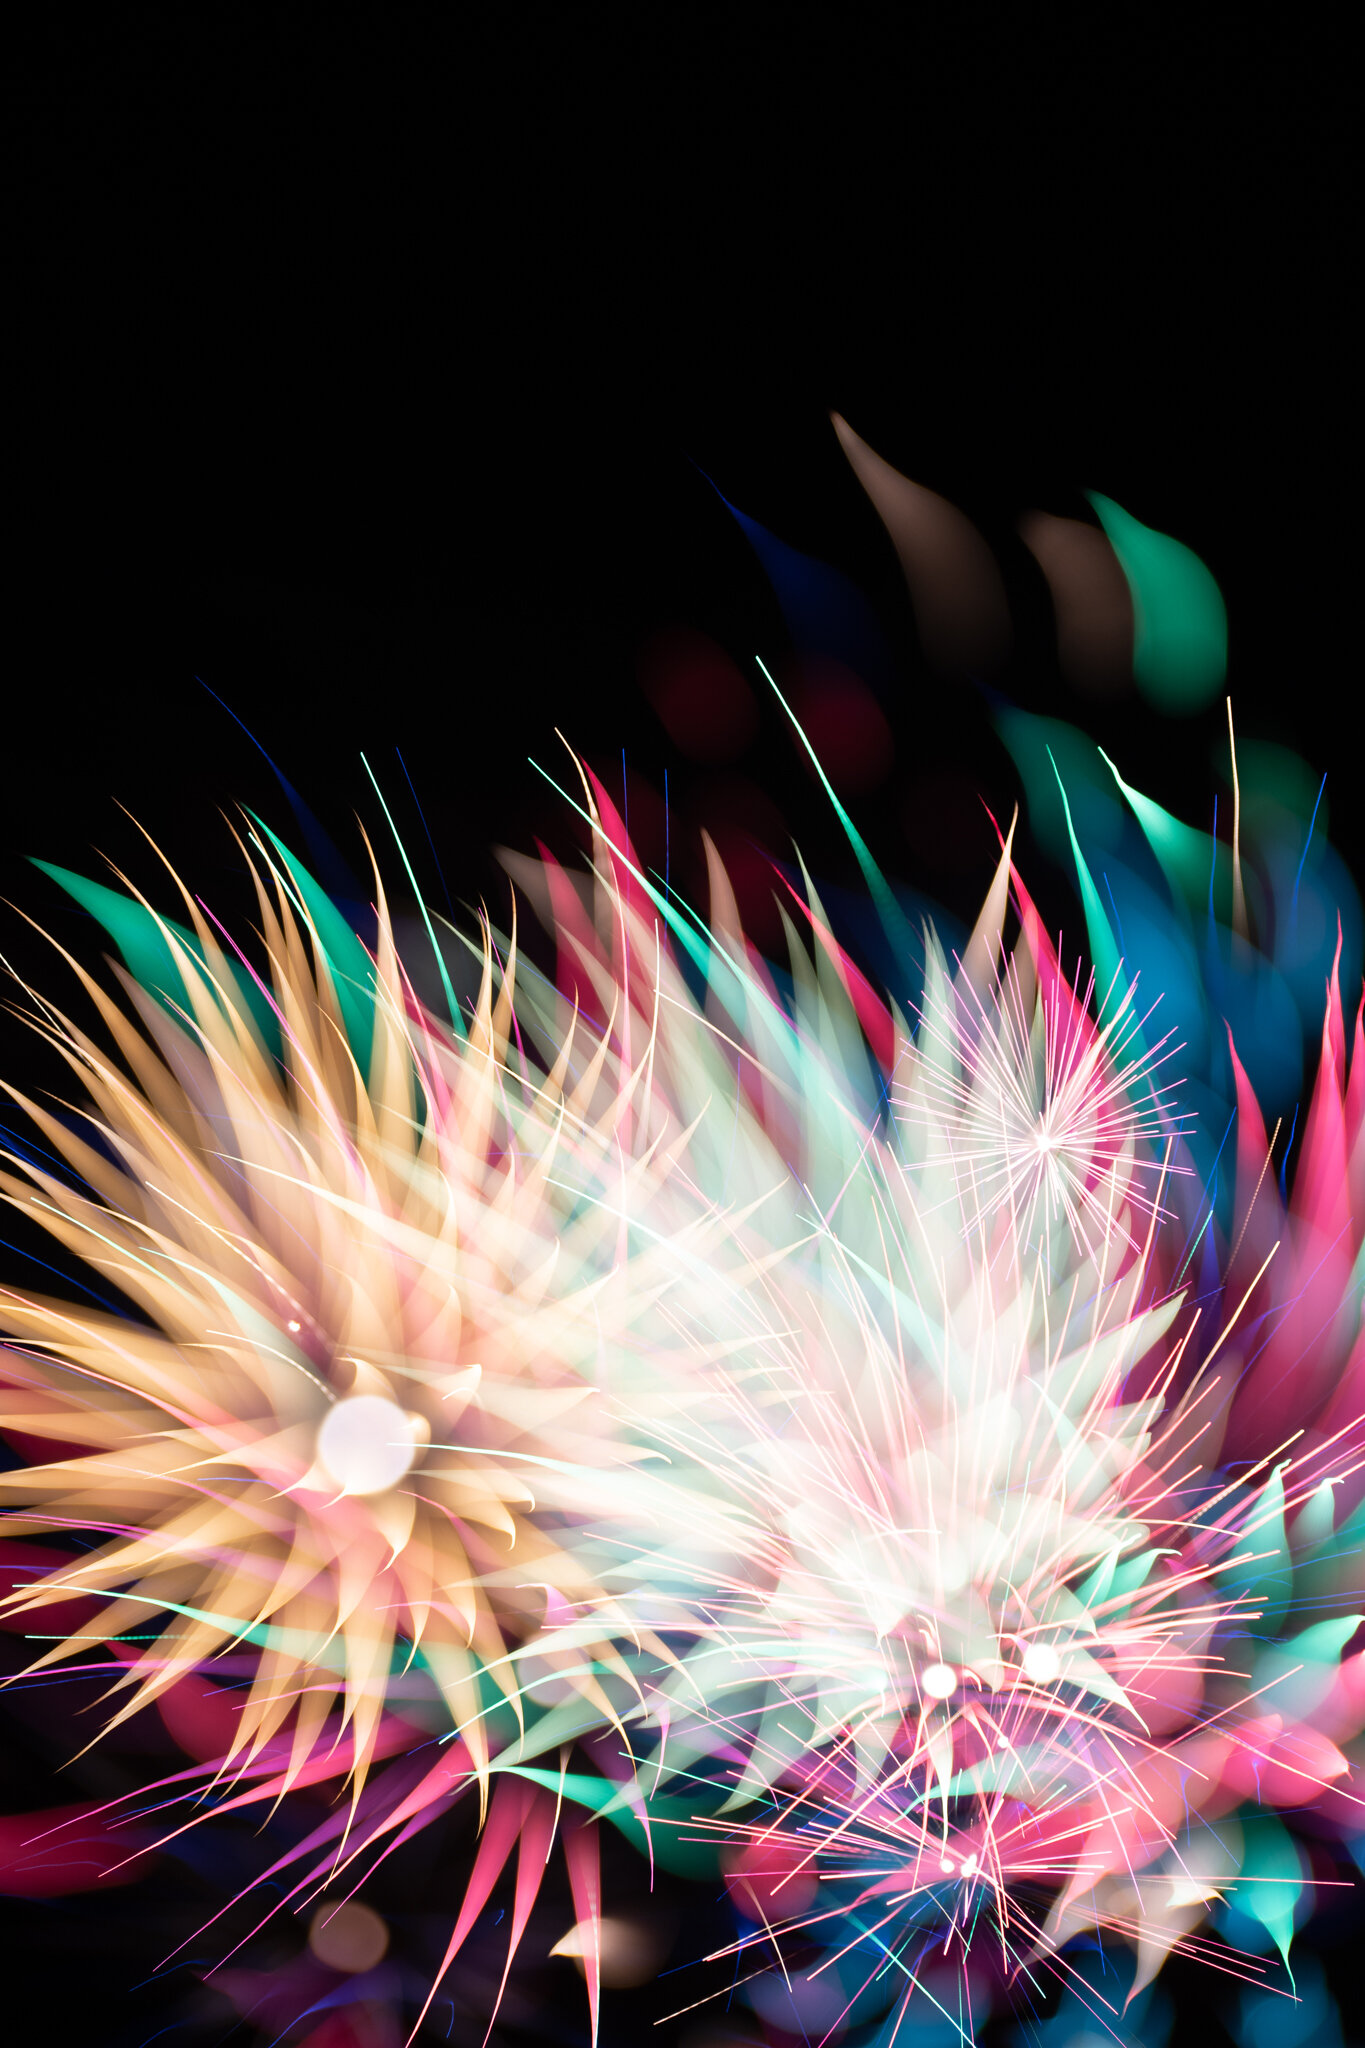 focuspulledfireworks-16.jpg